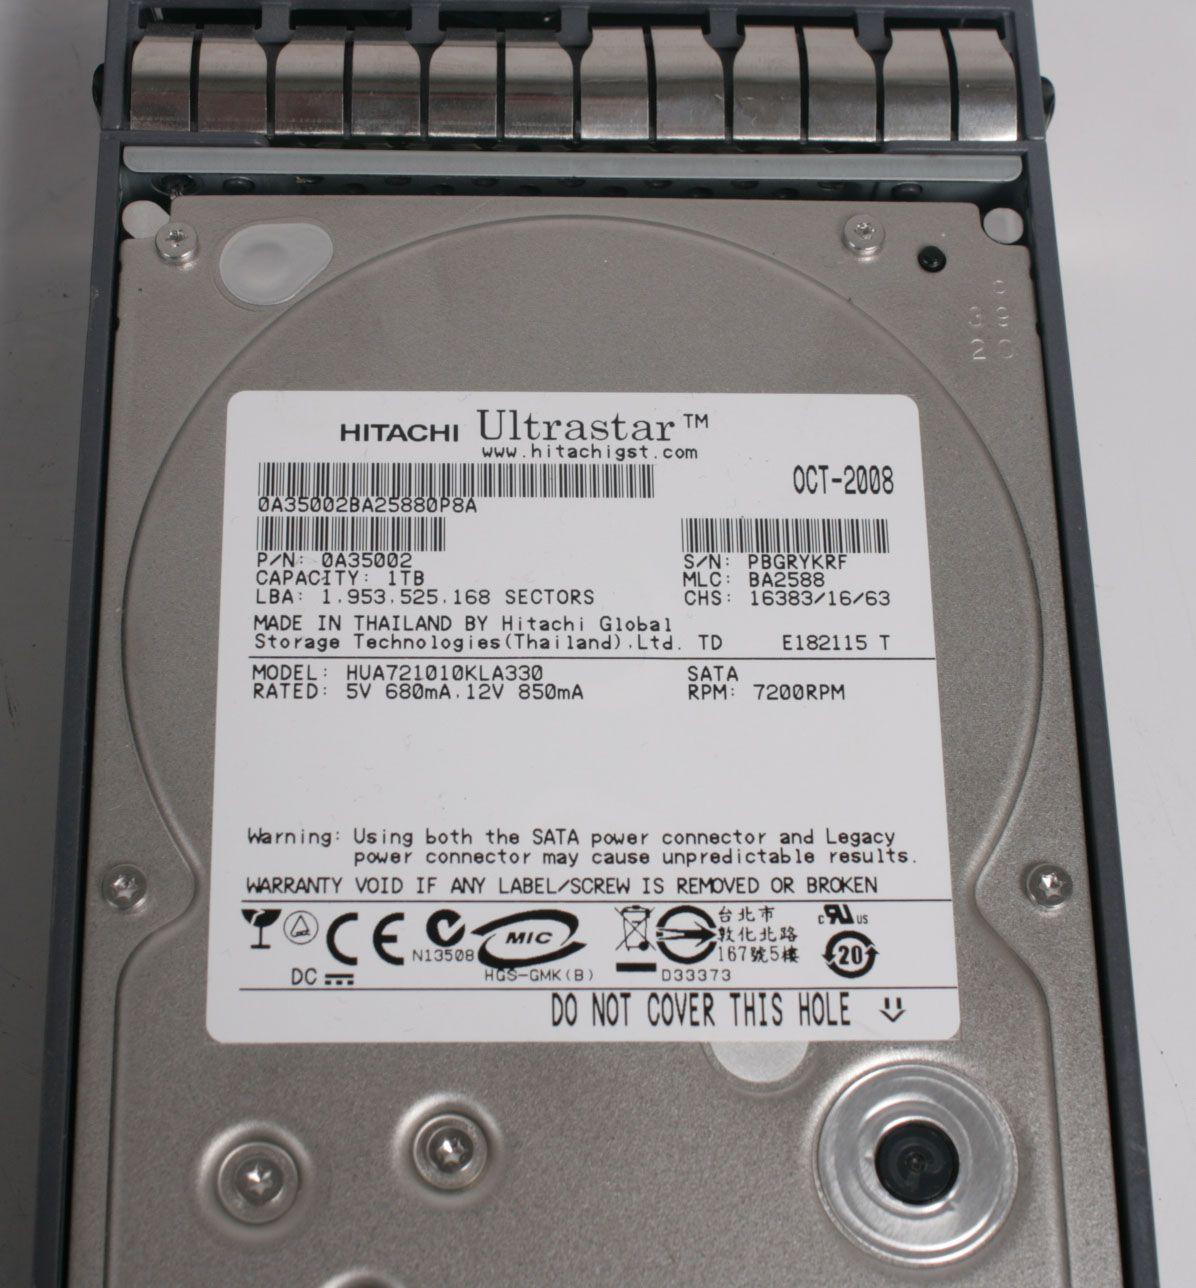 NetApp X269A-R5 HITACHI 1TB 7.2K SATA Hard Drive 108-00180+A3 DS14 MK2